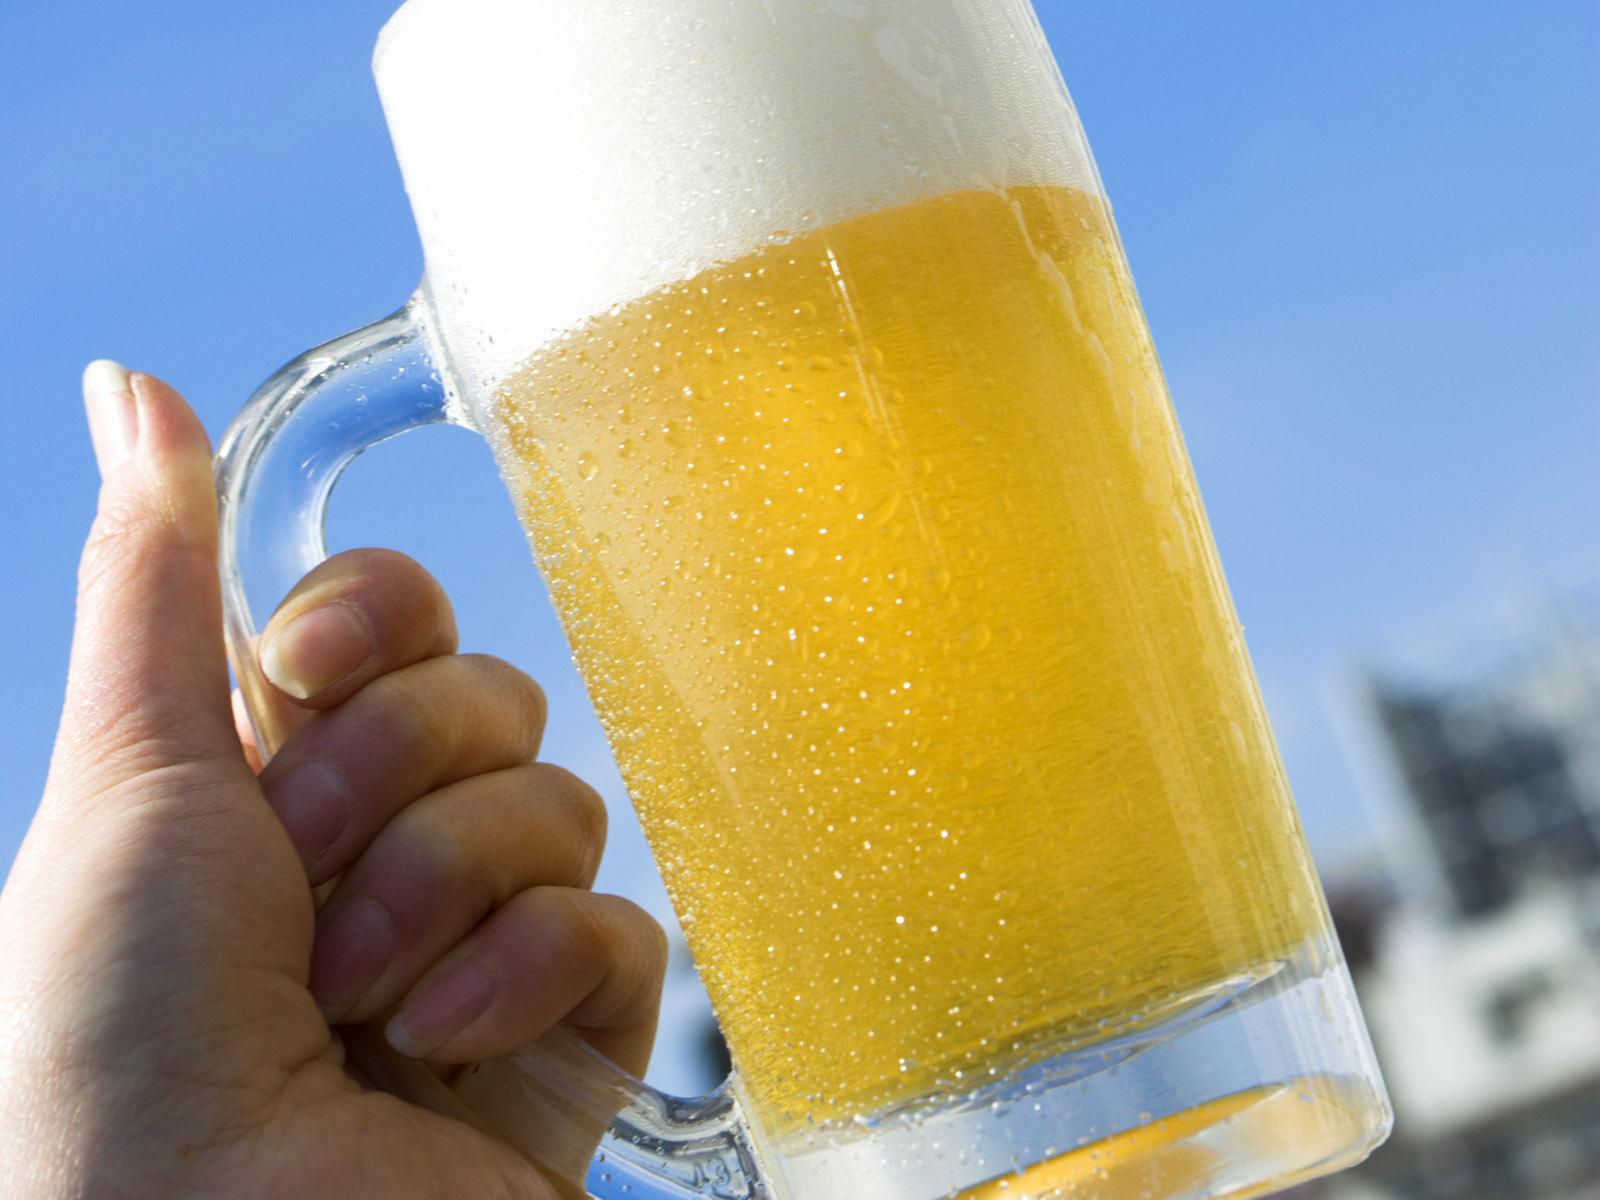 Beer-1-HTHTD0KWHU-1600x1200[1]